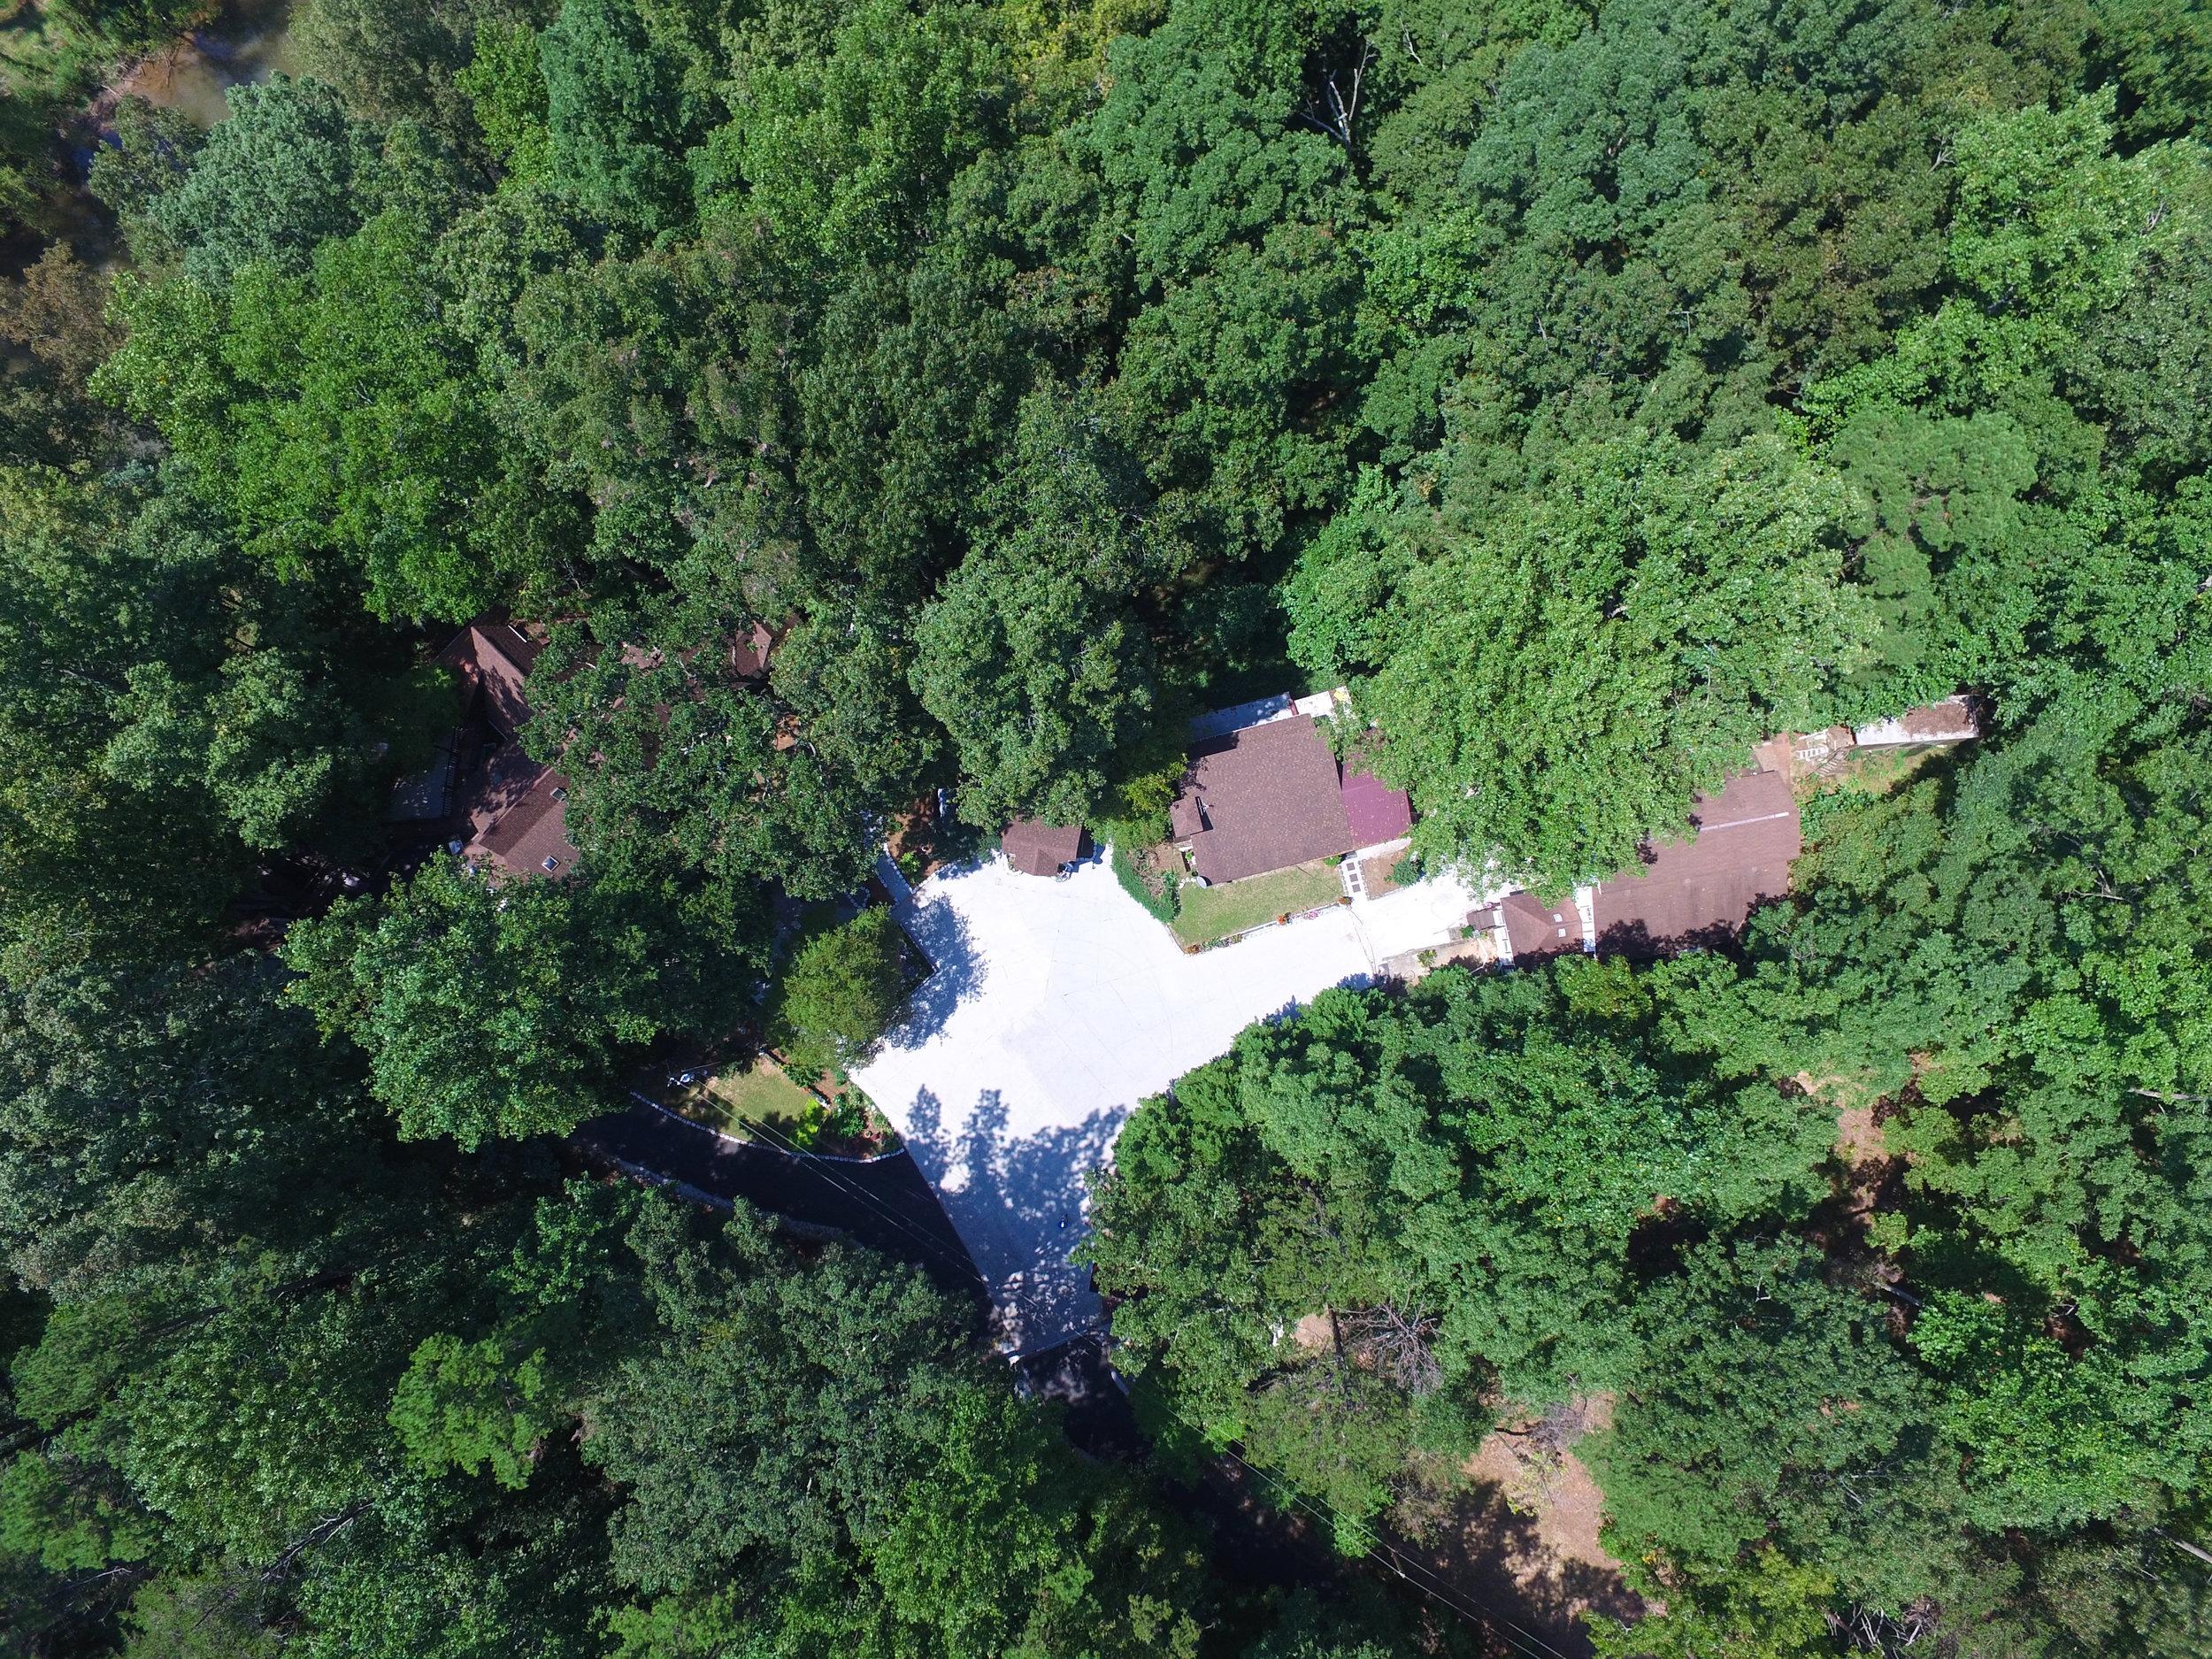 quinlan_aerial_edits-7.jpg